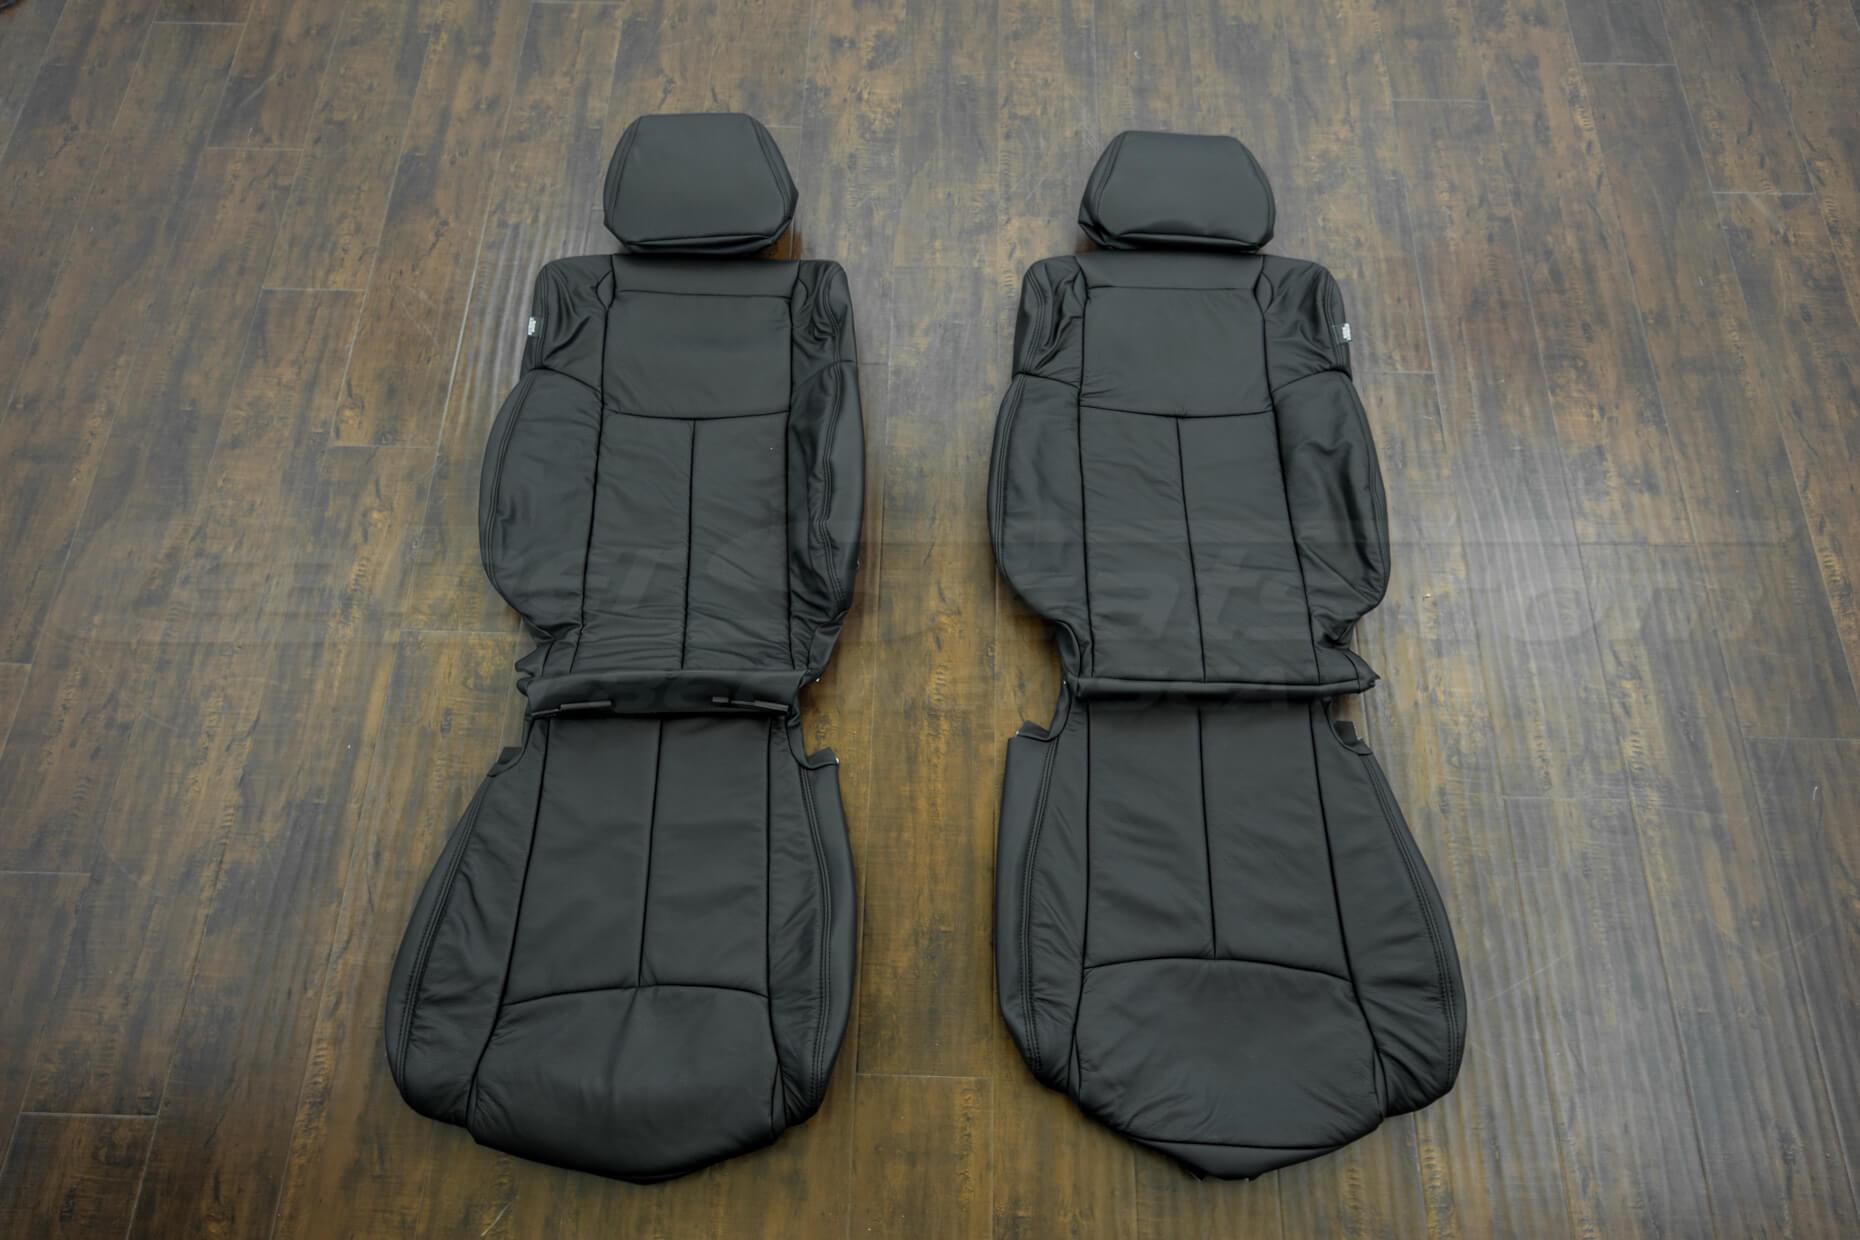 2009-2014 Nissan Maxima Upholstery Kit - Front seats